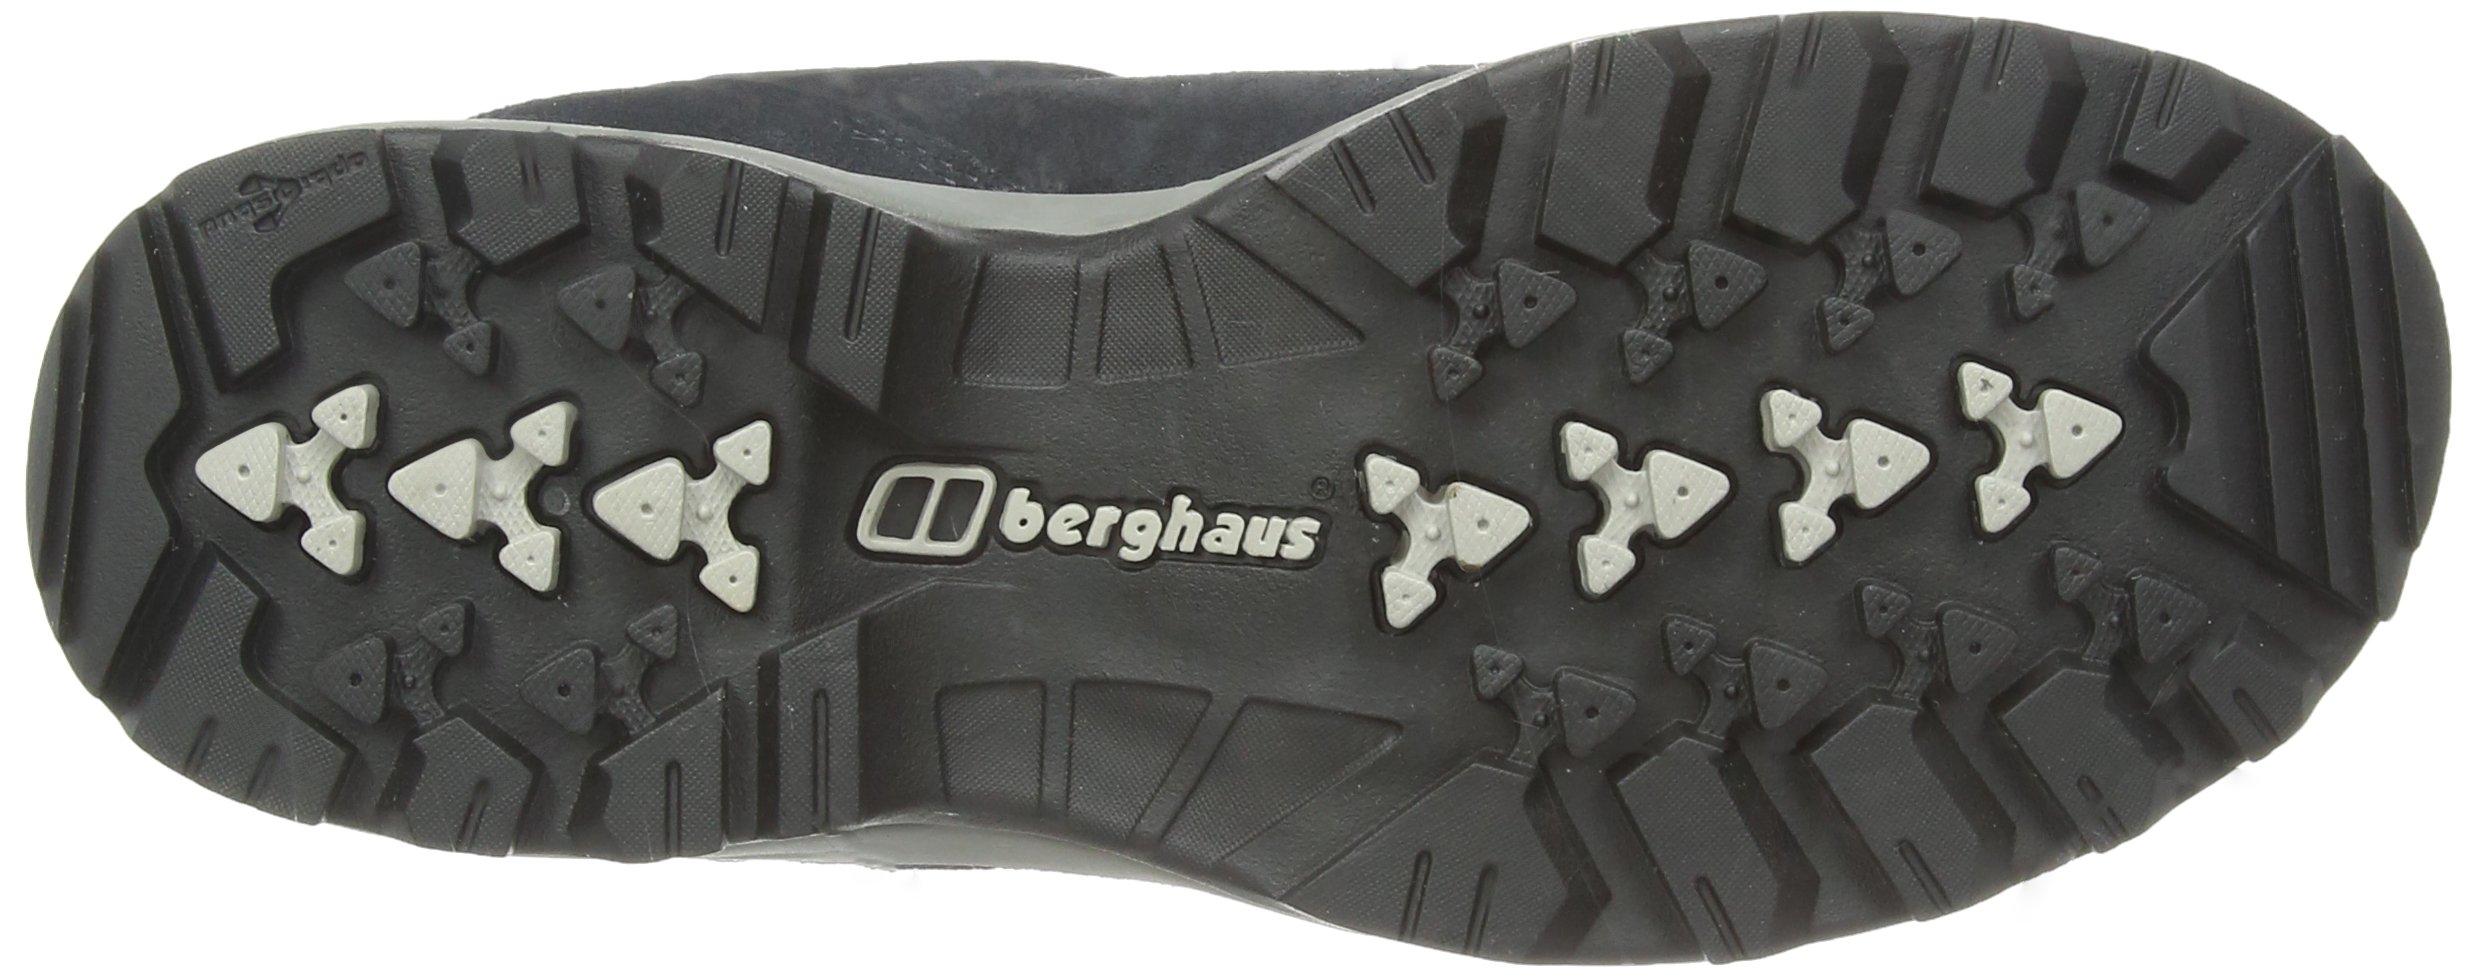 Berghaus Women's Explorer Trail Plus GTX Walking Boots 3